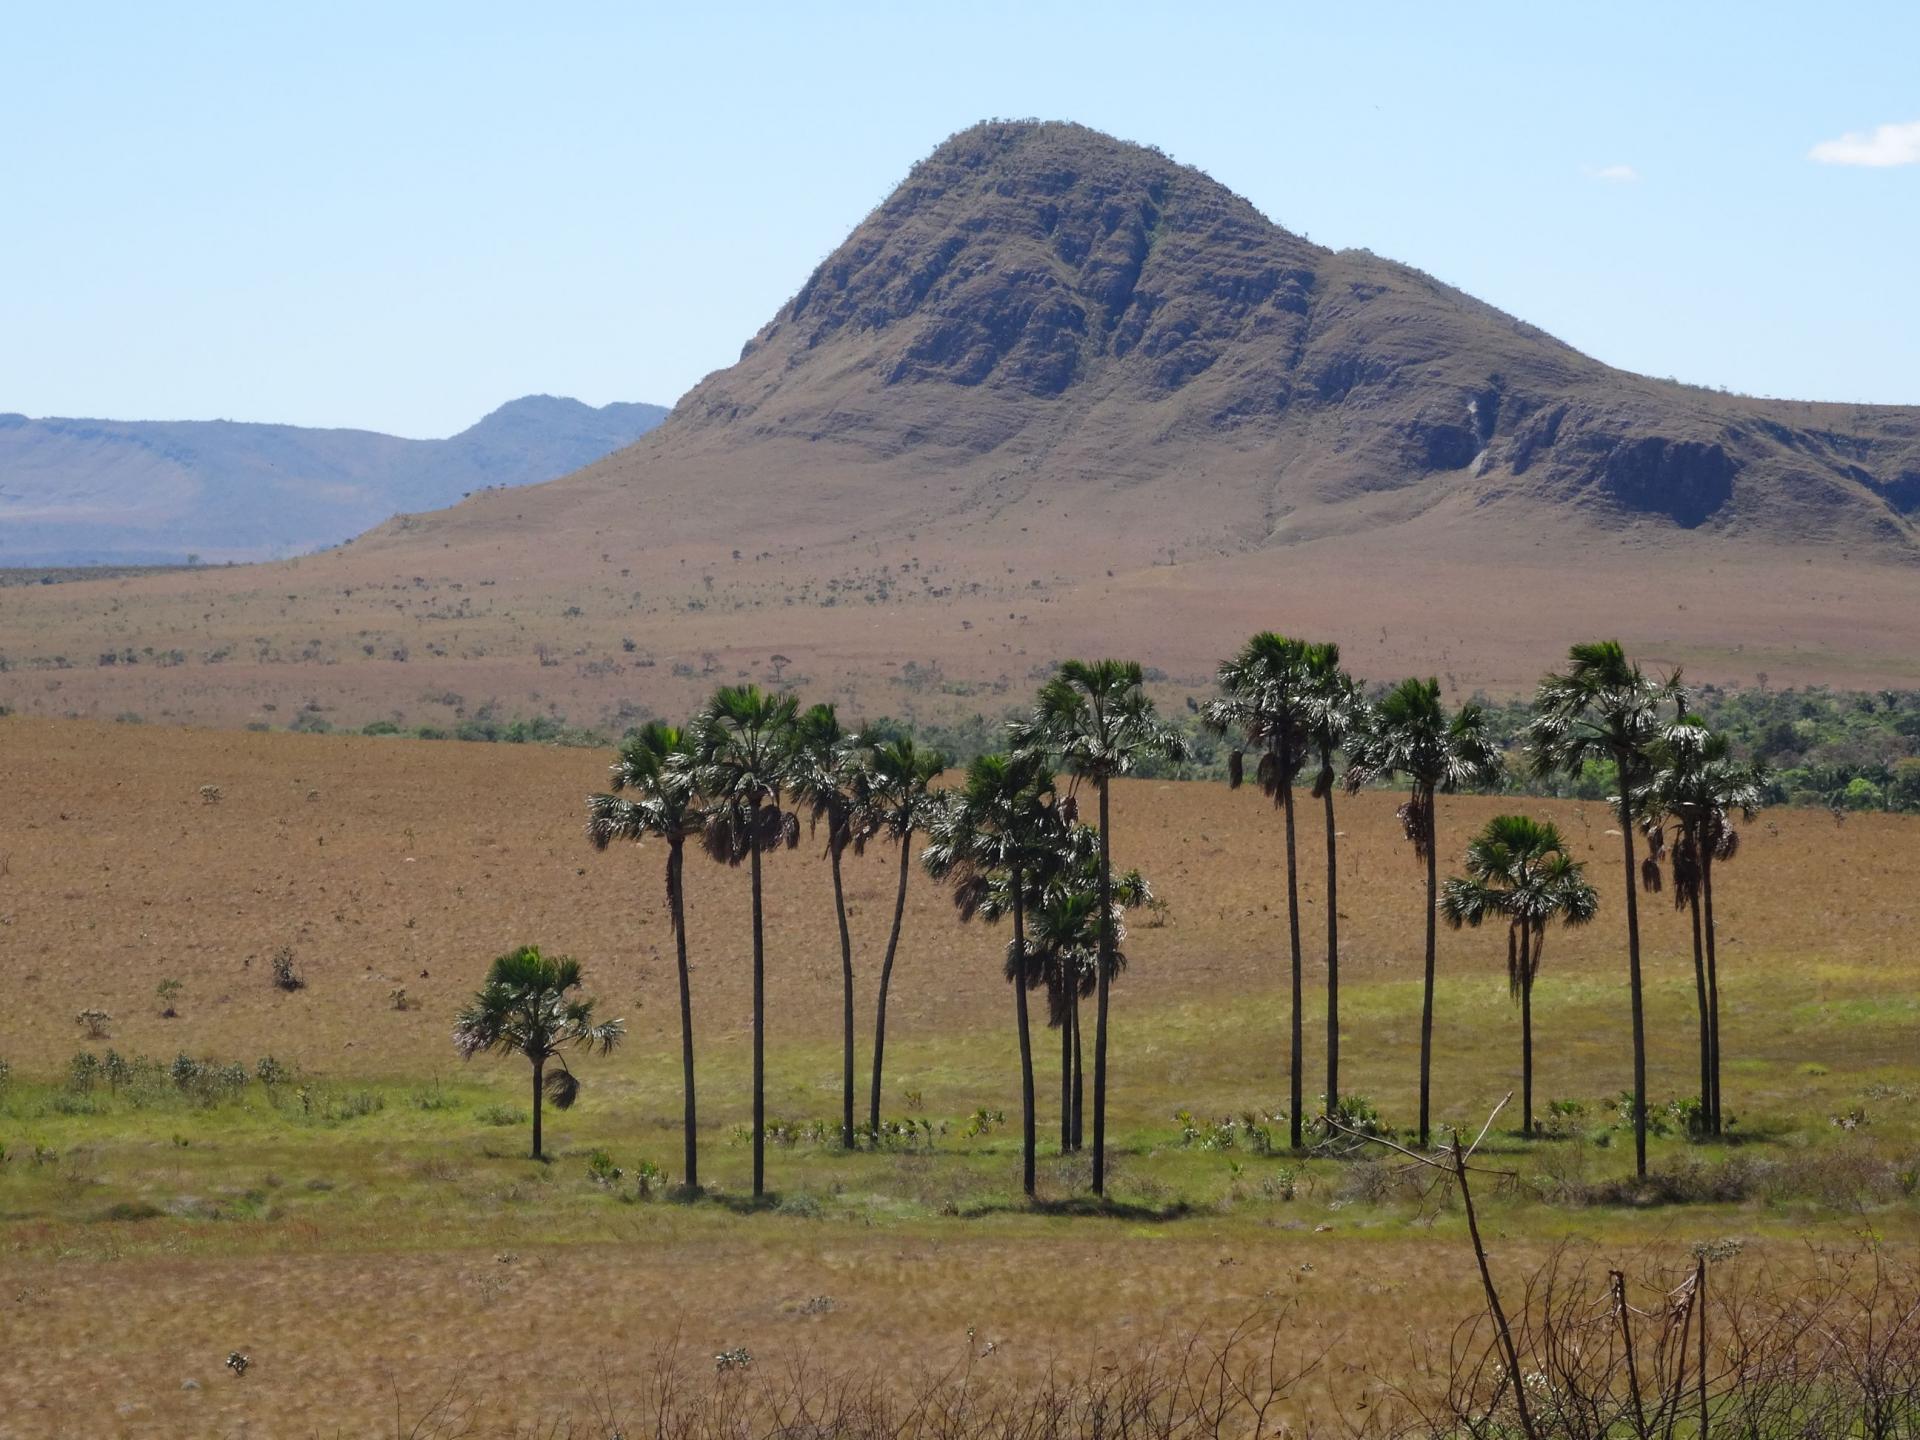 The breathtaking landscape of Chapada dos Veadeiros